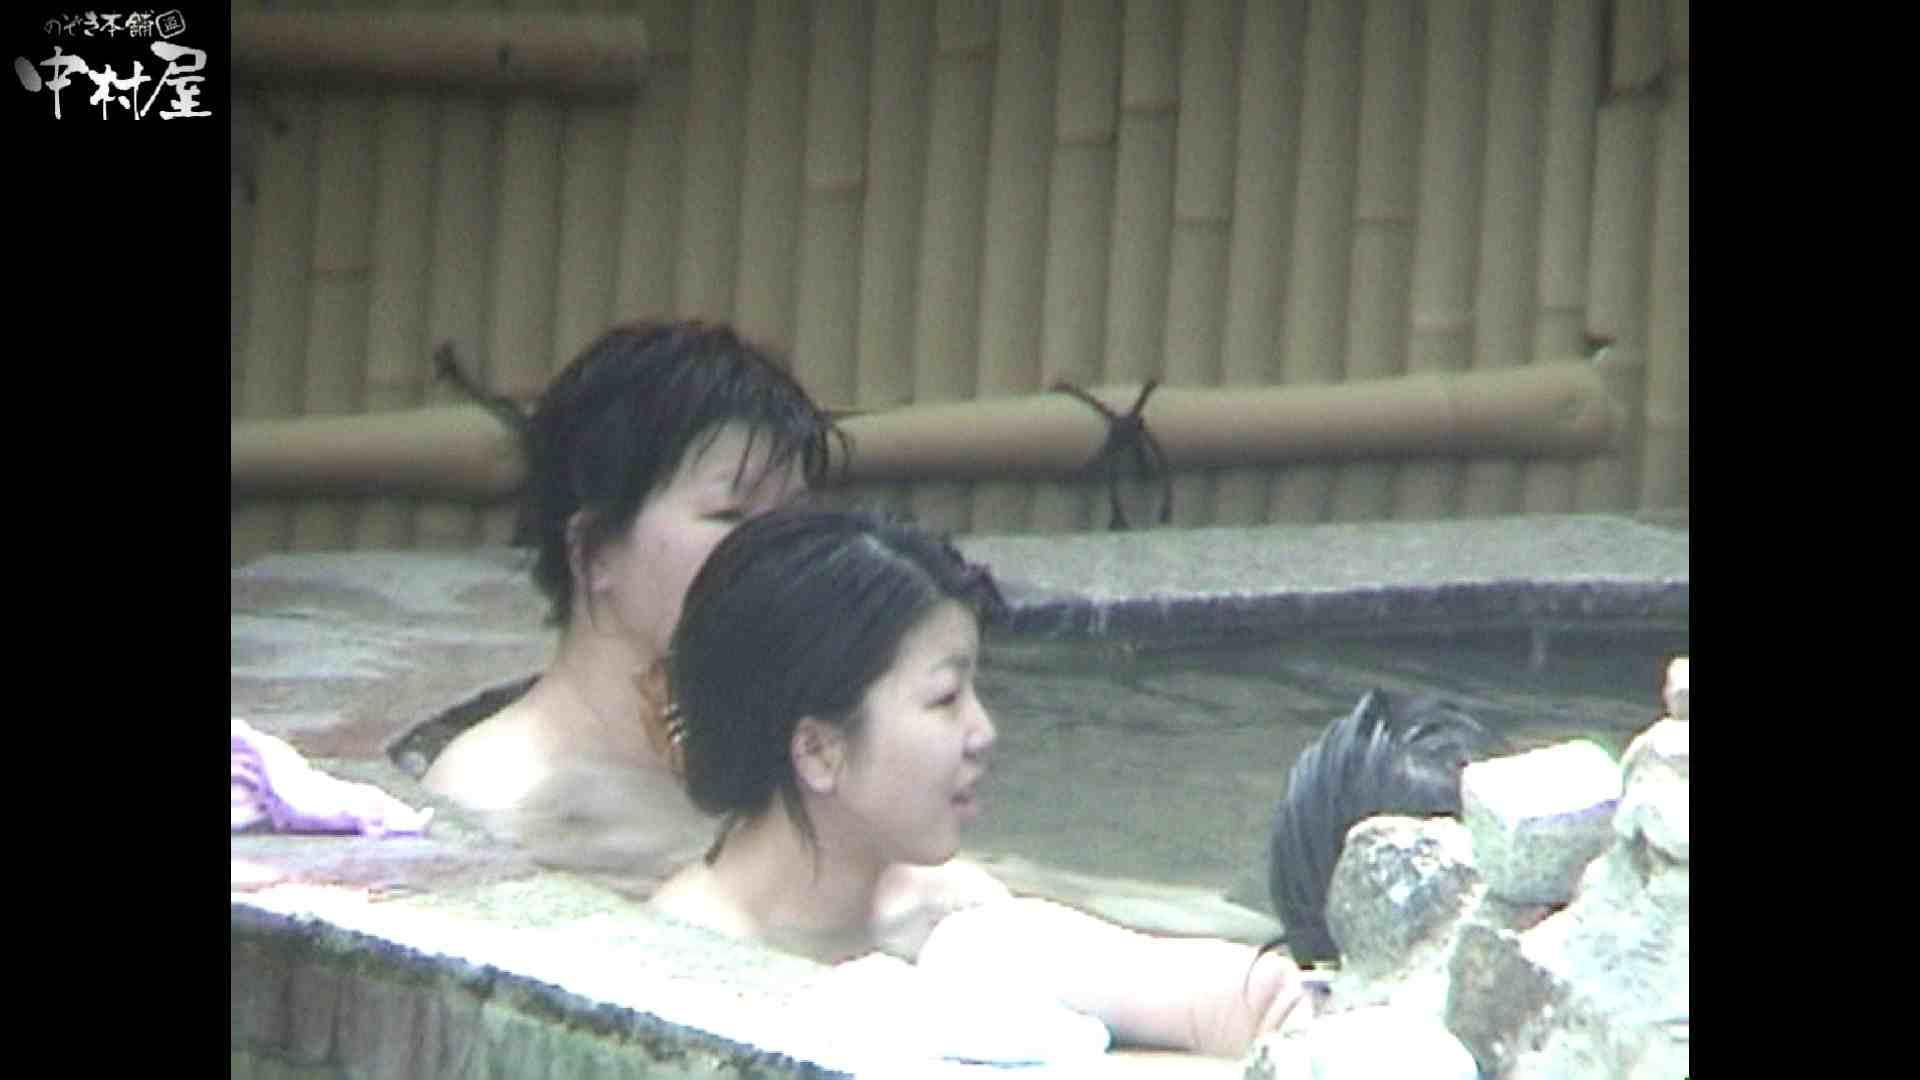 Aquaな露天風呂Vol.936 盗撮映像  110Pix 53